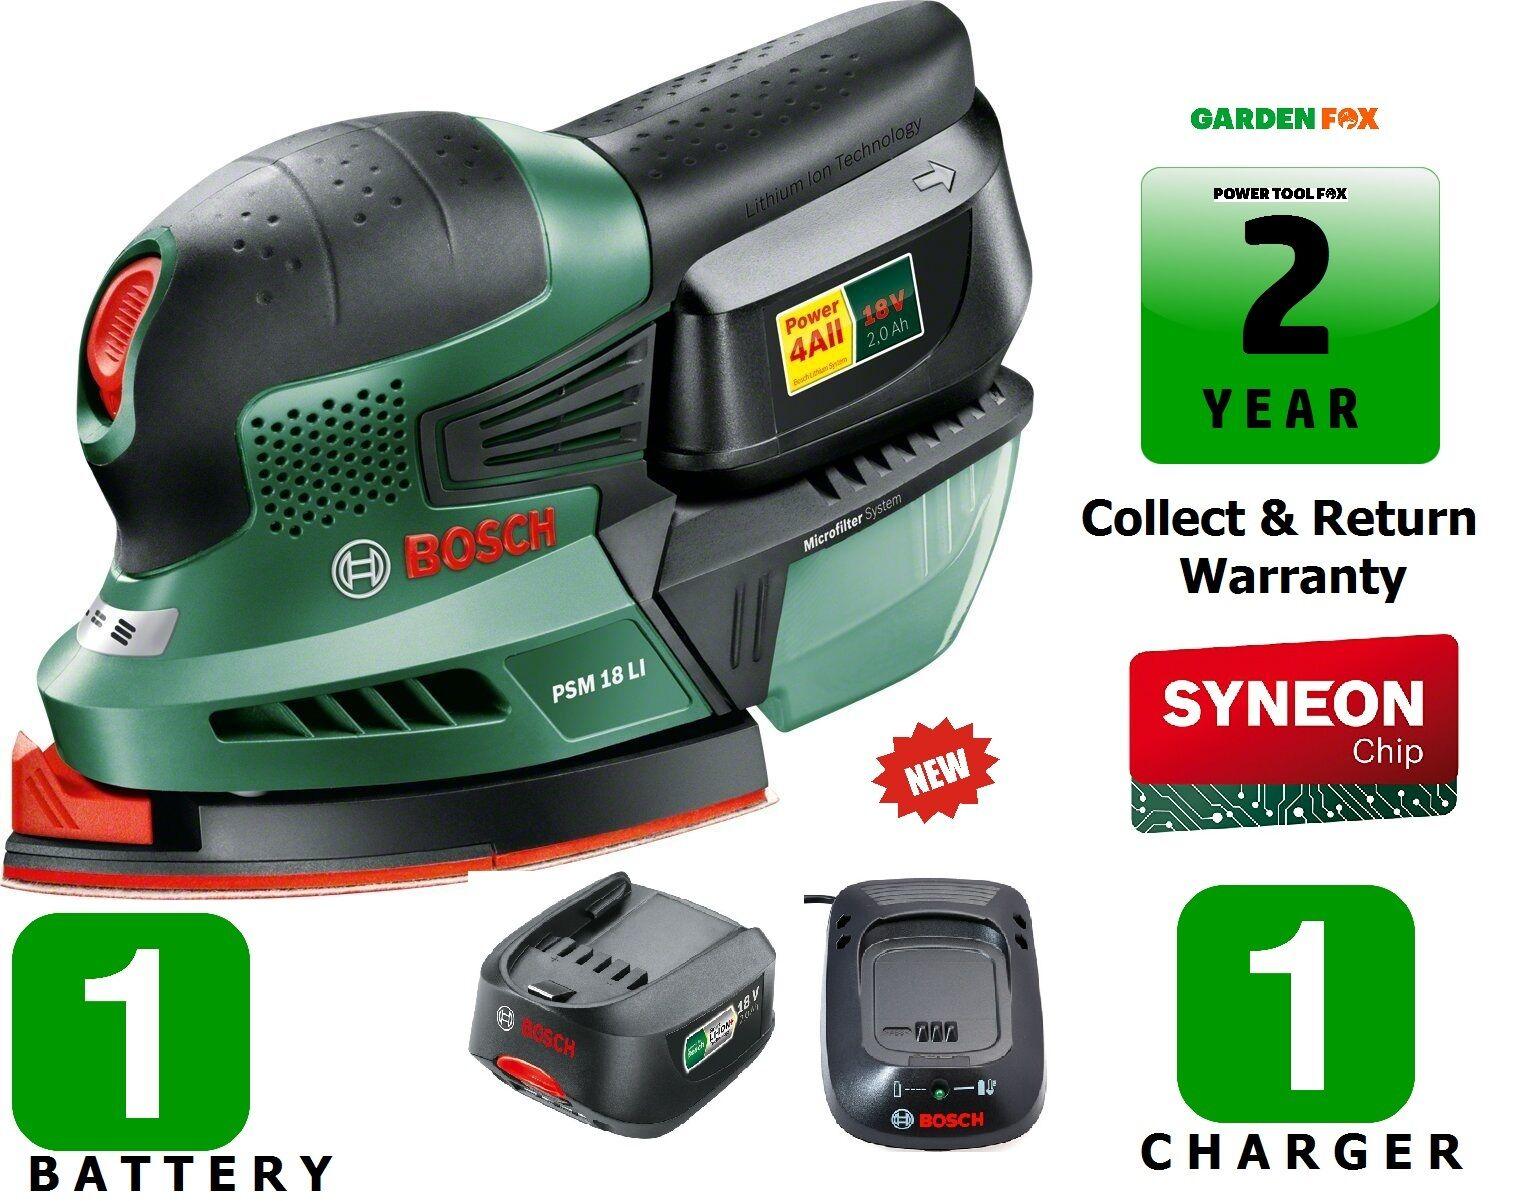 Savers Bosch PSM18Li Cordless SANDER - 06033A1372 3165140740036 D